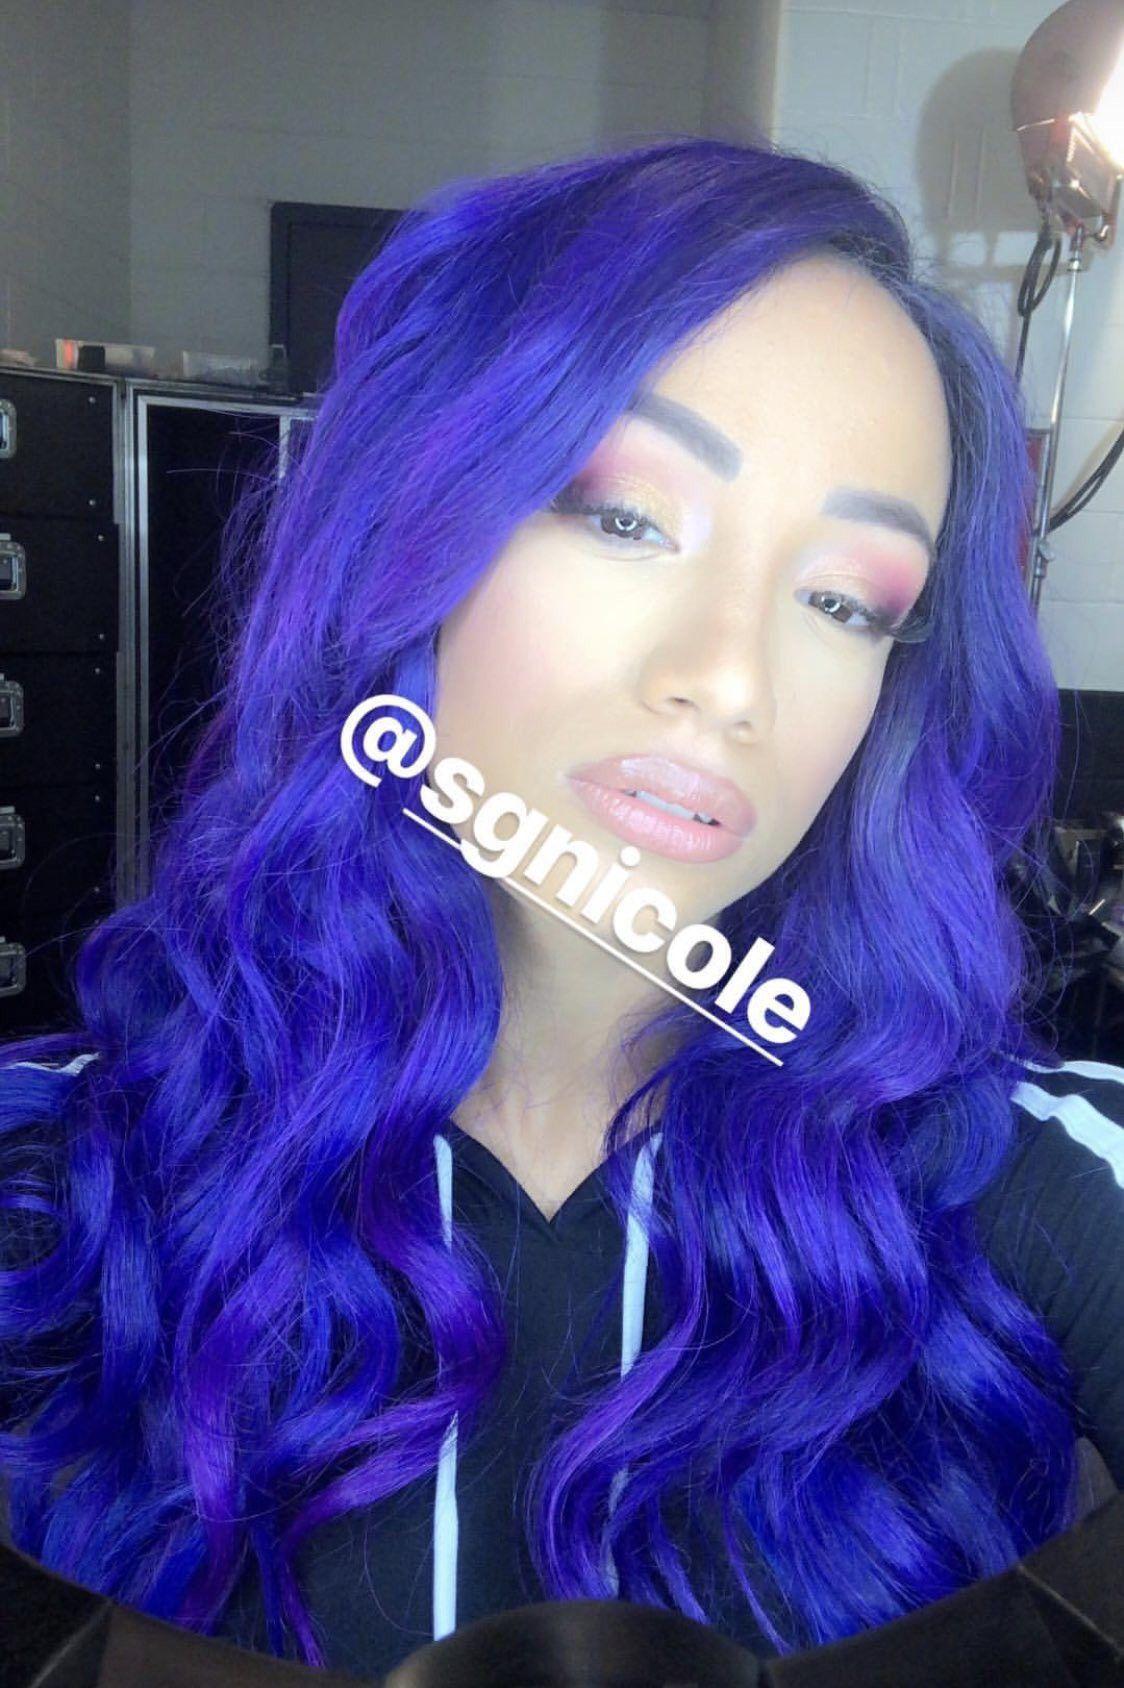 Sasha Banks Sasha Bank Wwe Sasha Banks Wwe Raw Women